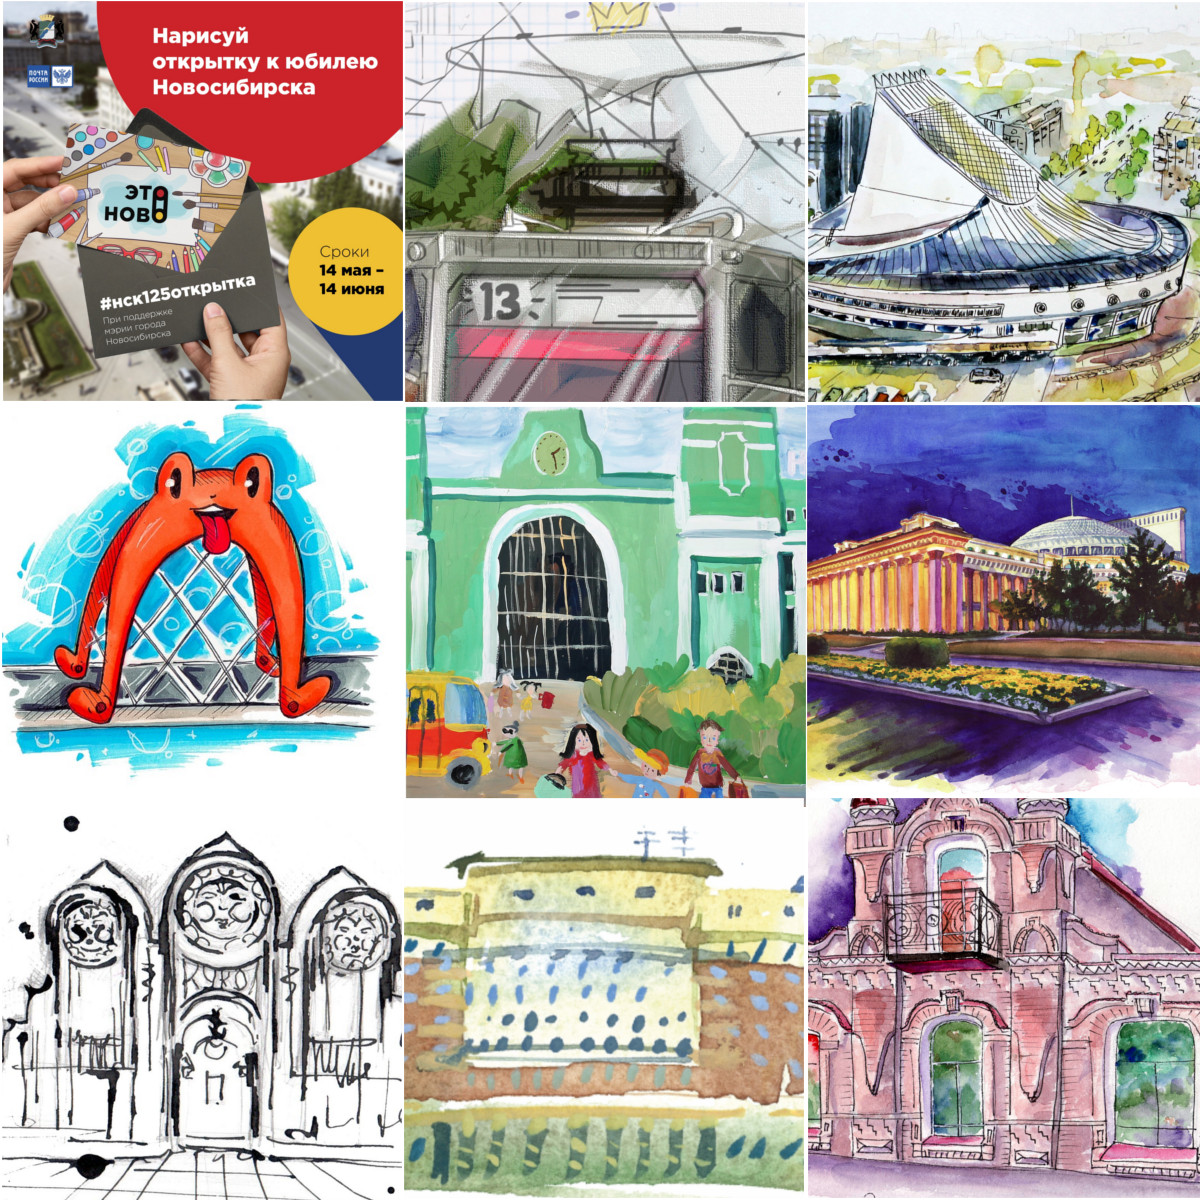 Картинки, открытки к юбилею в новосибирске